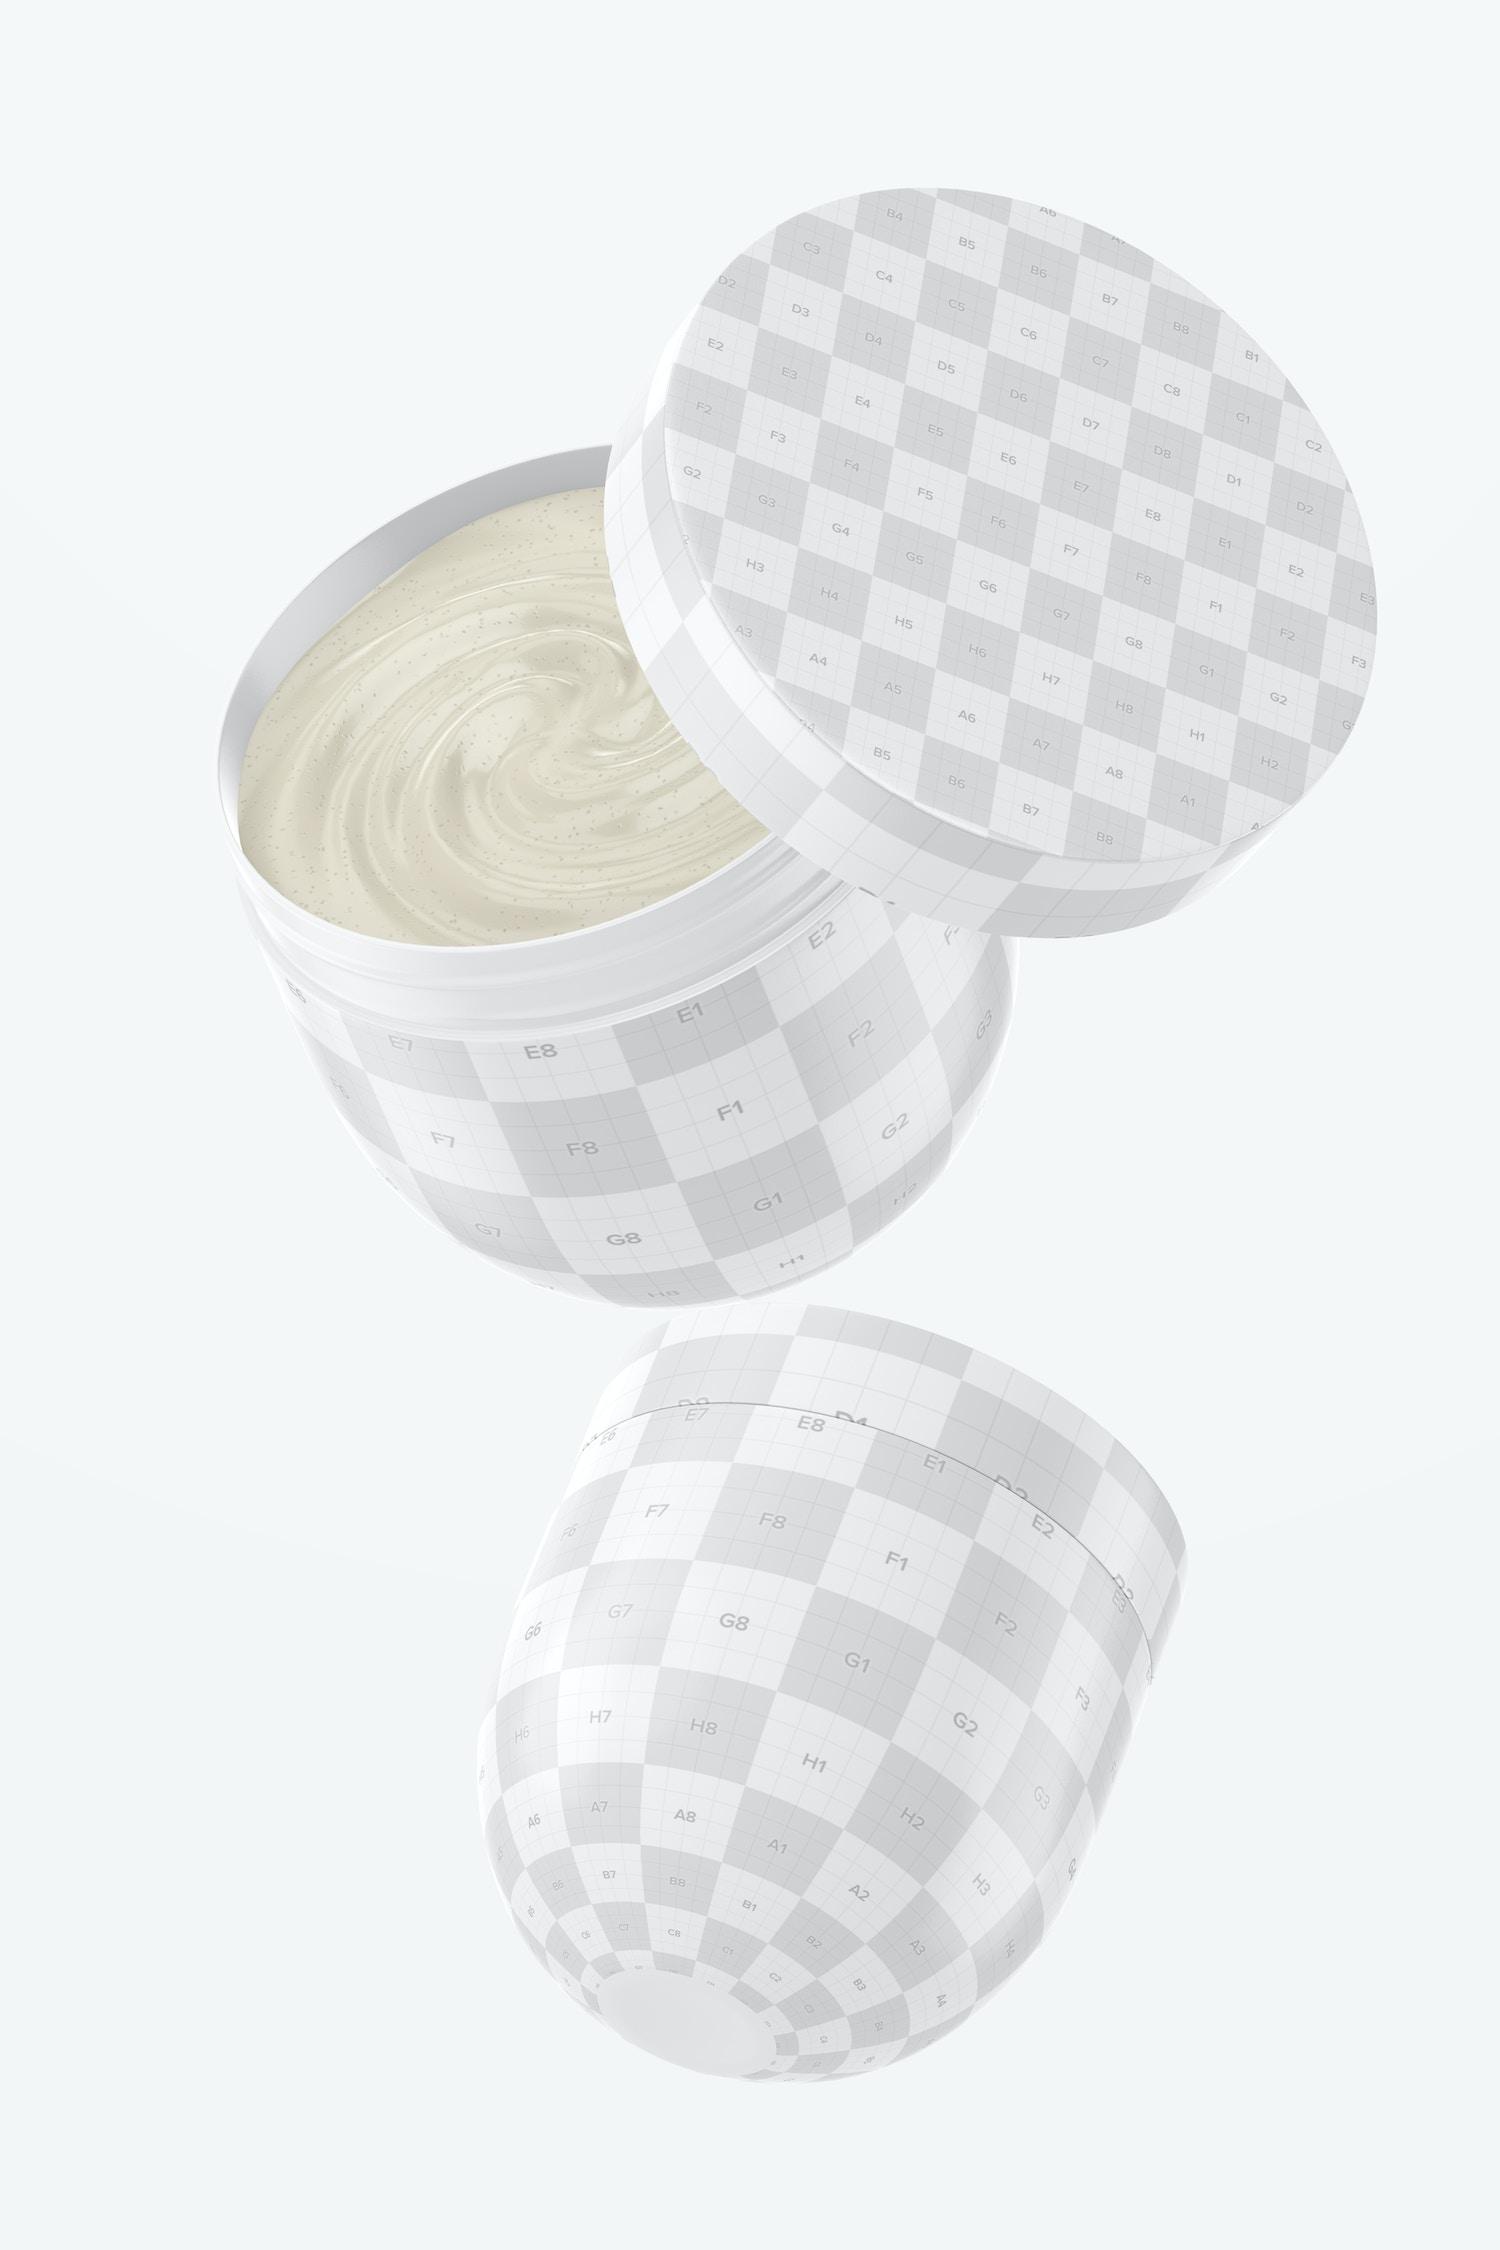 Hair Mask Jars Mockup, Floating